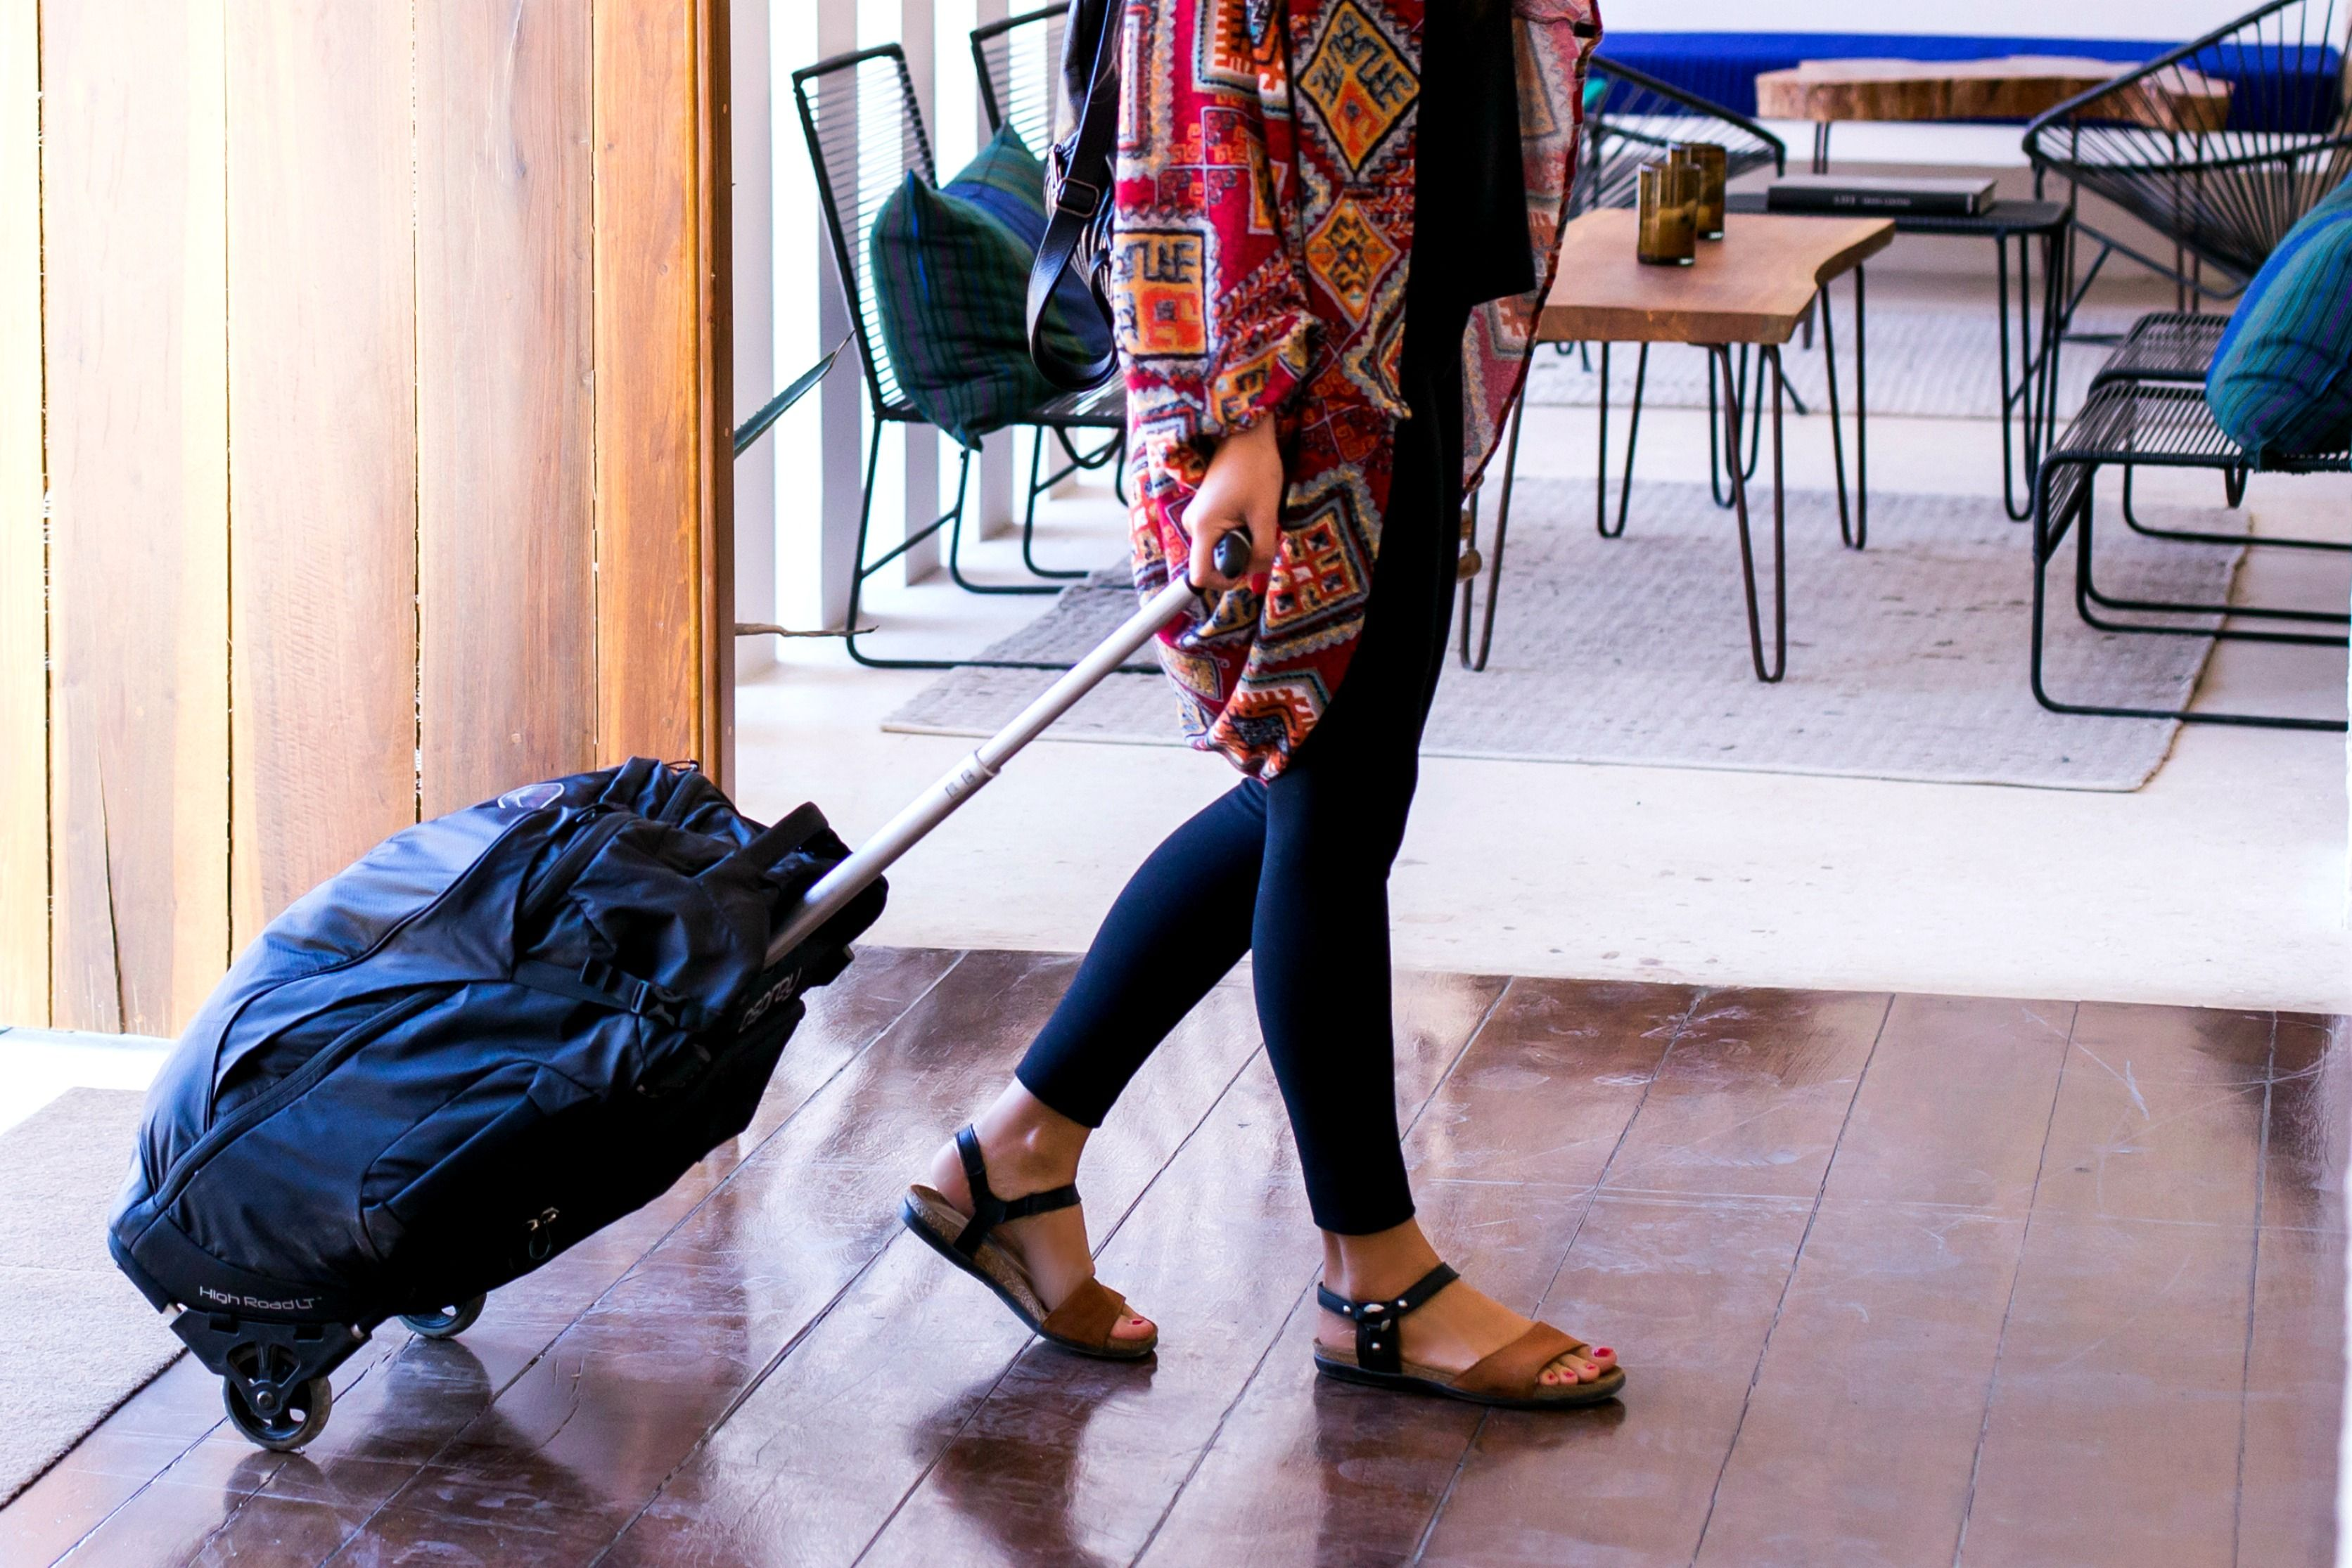 moose en felt myfeltboots winter comforter walking for my comfortable boots women feltboots catalog valenki shoes